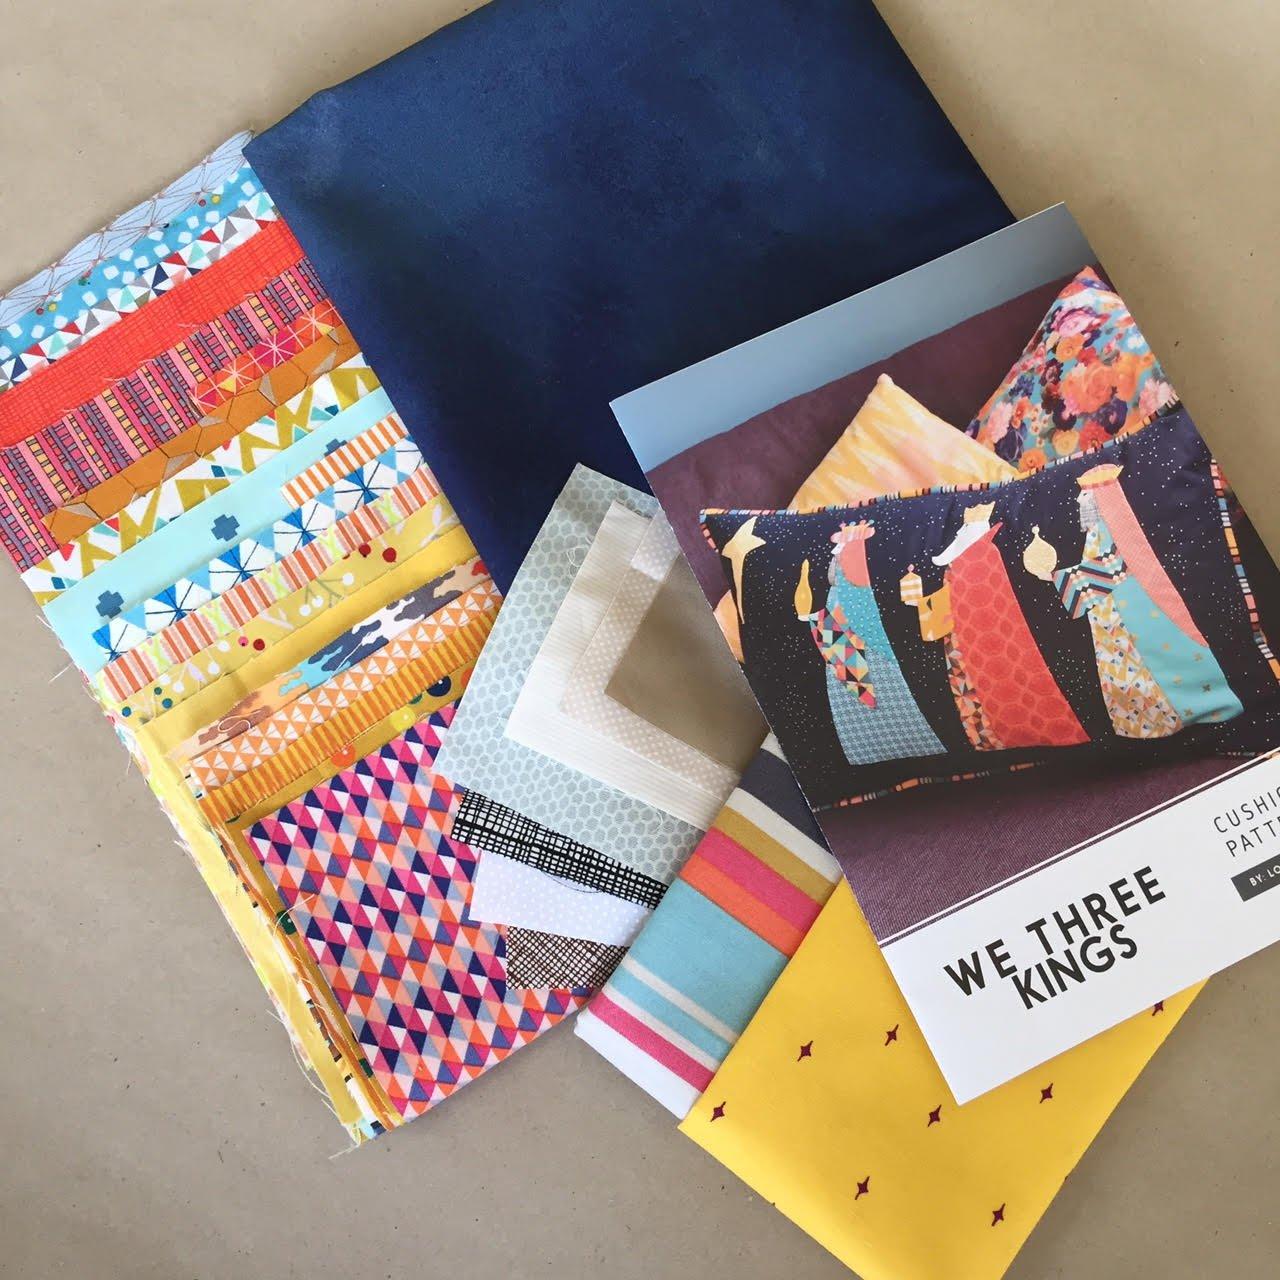 We Three Kings Cushion Kit by Louise Papas